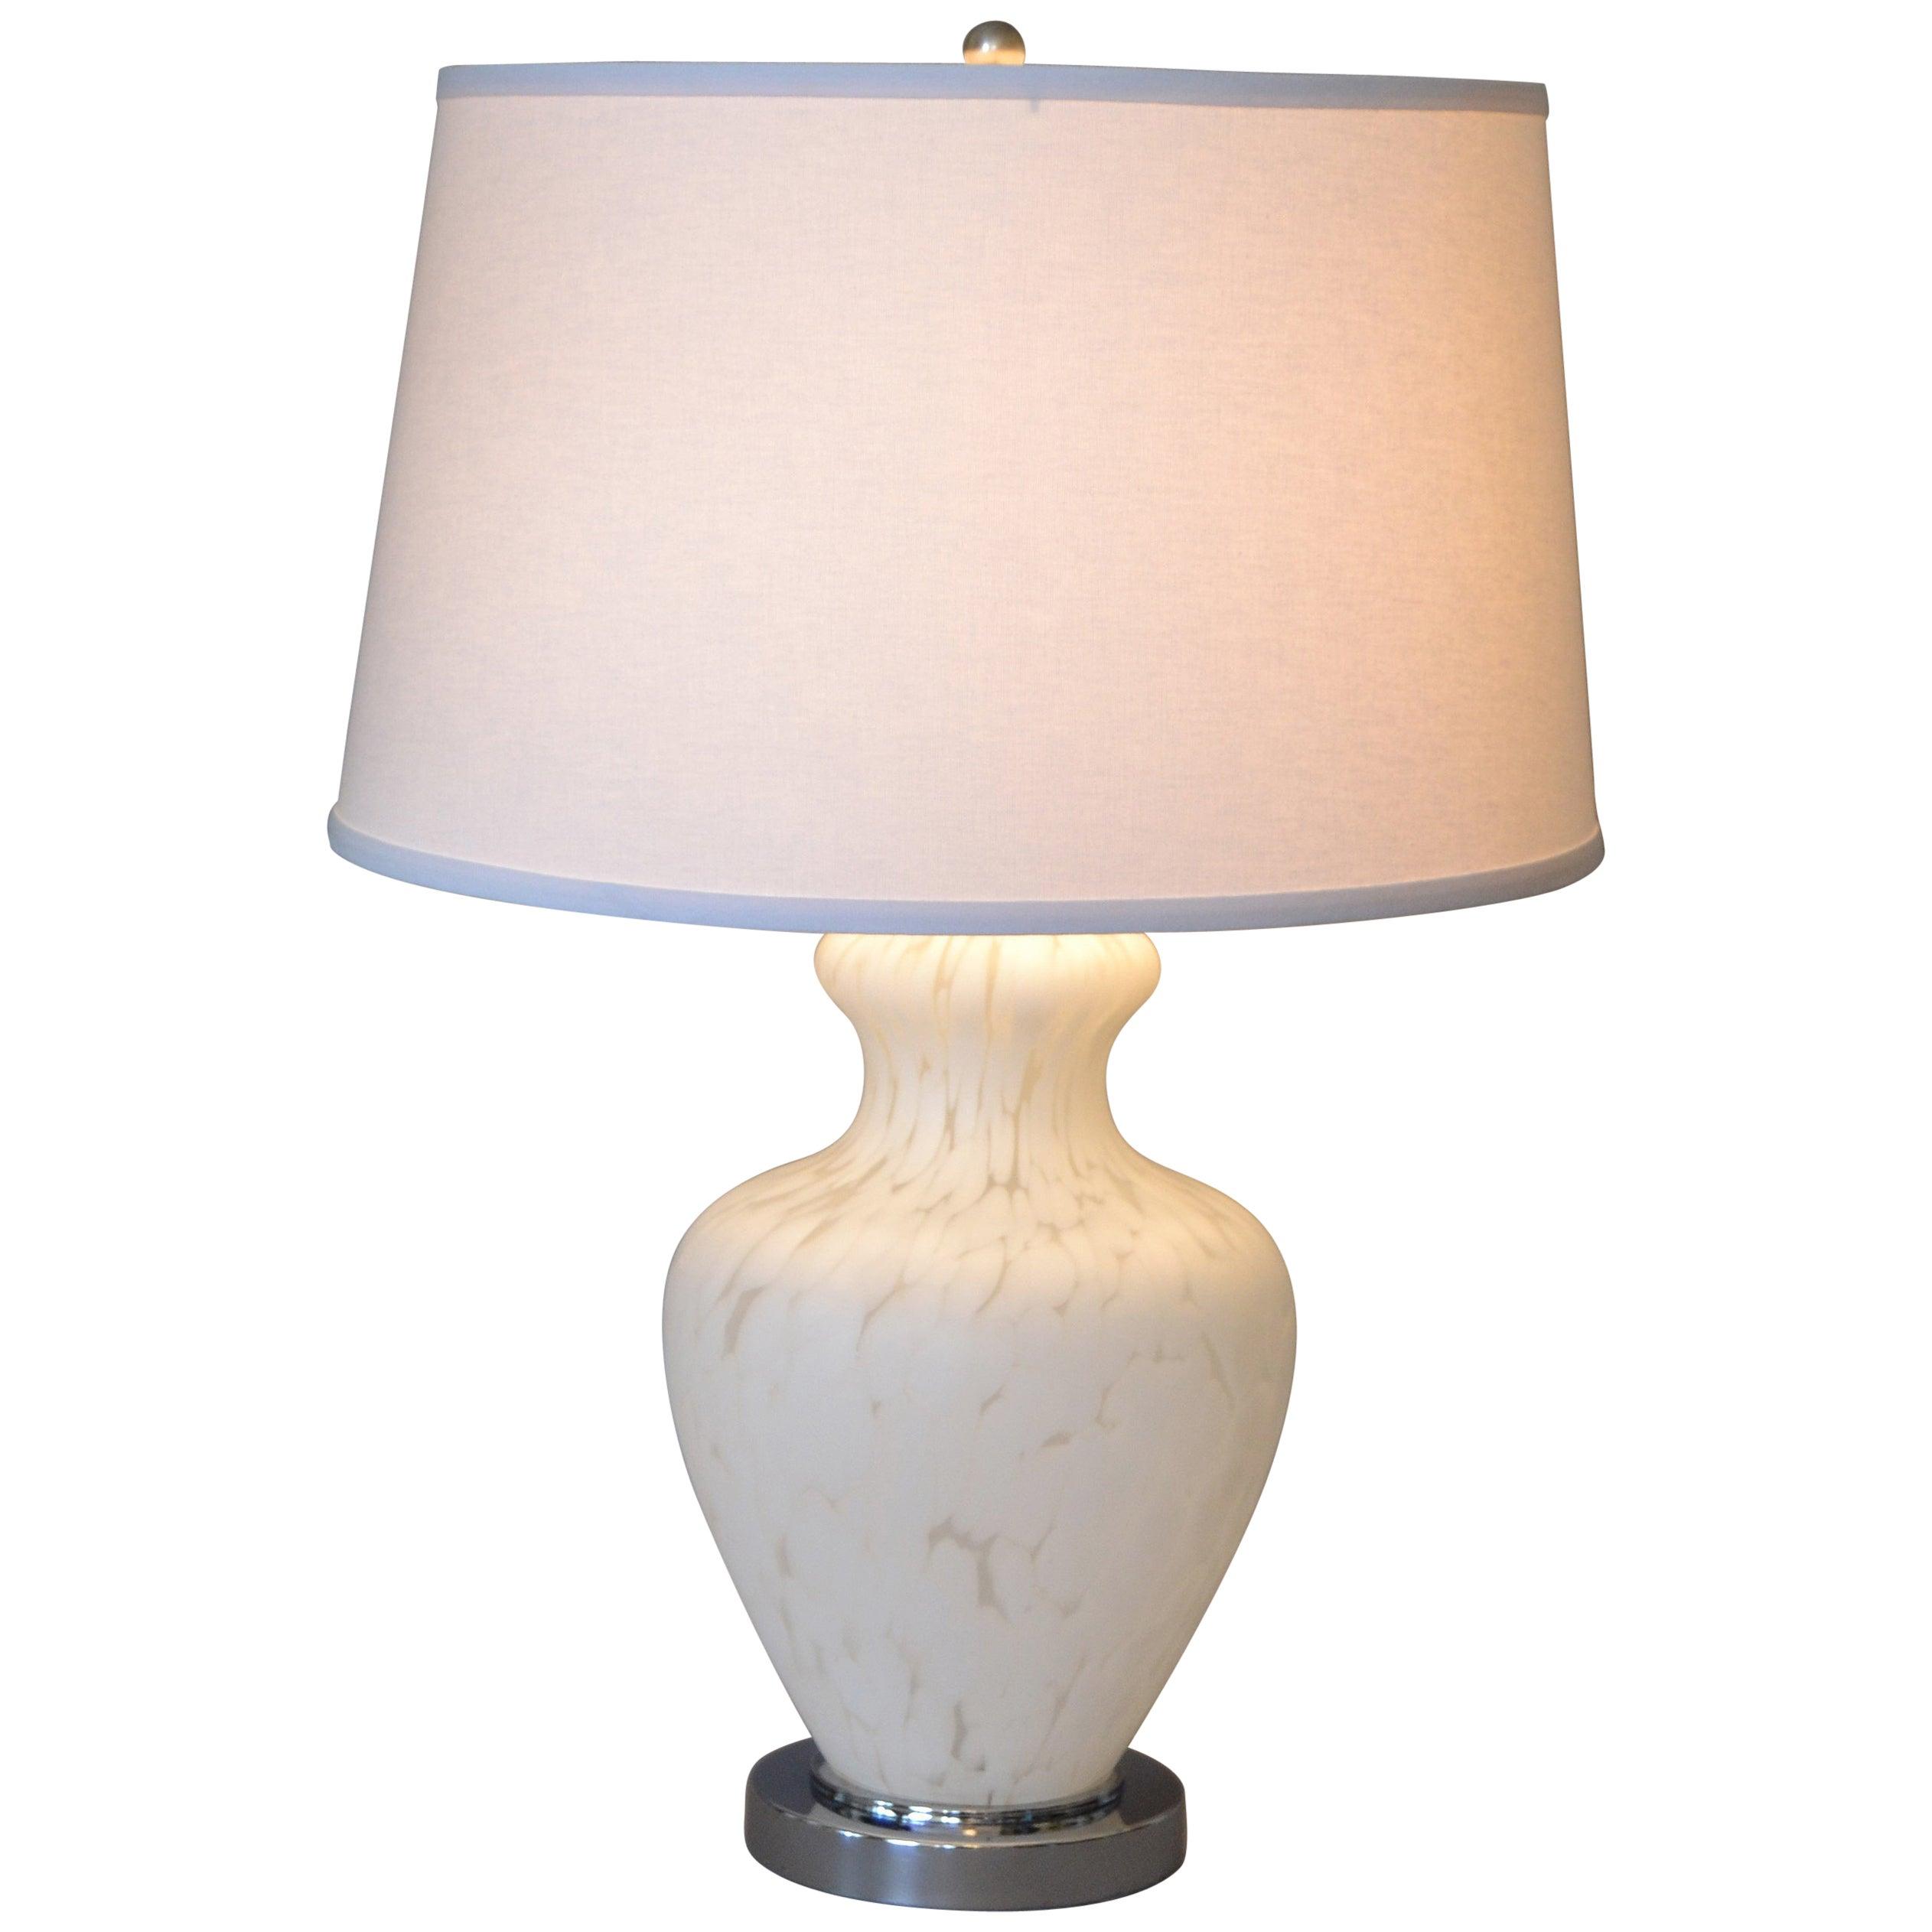 Italian Hand Blown Murano Glass and Chrome Table Lamp